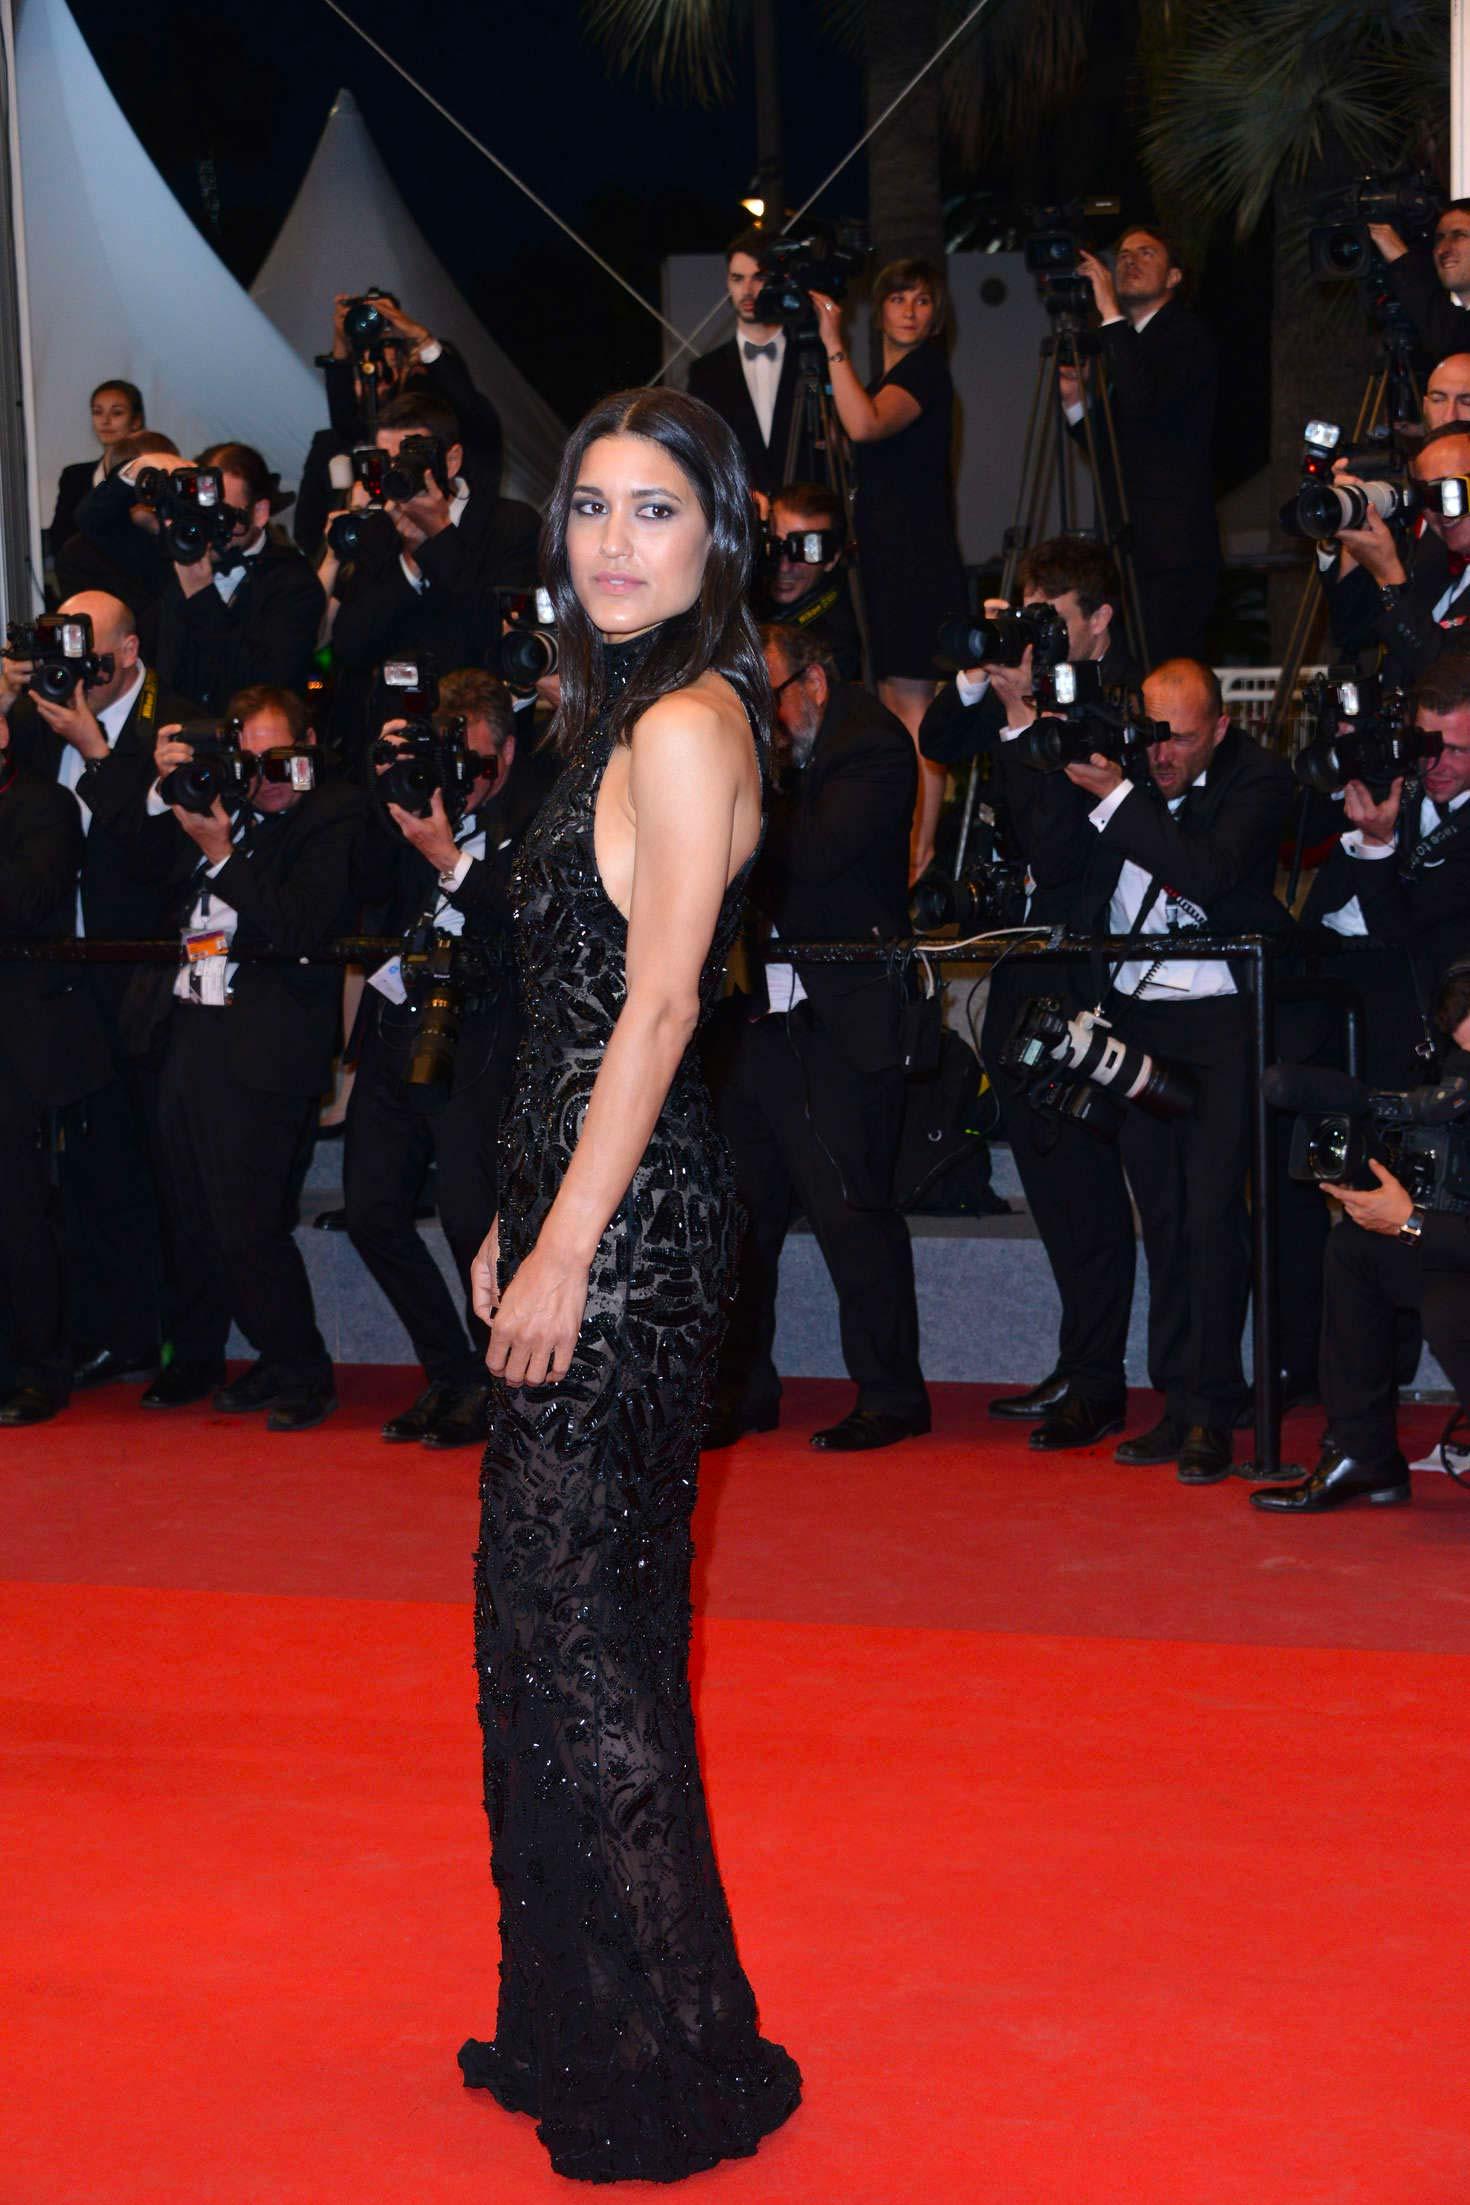 Cannes 2017 - Day 4 - The Square première - Actress Julia Jones